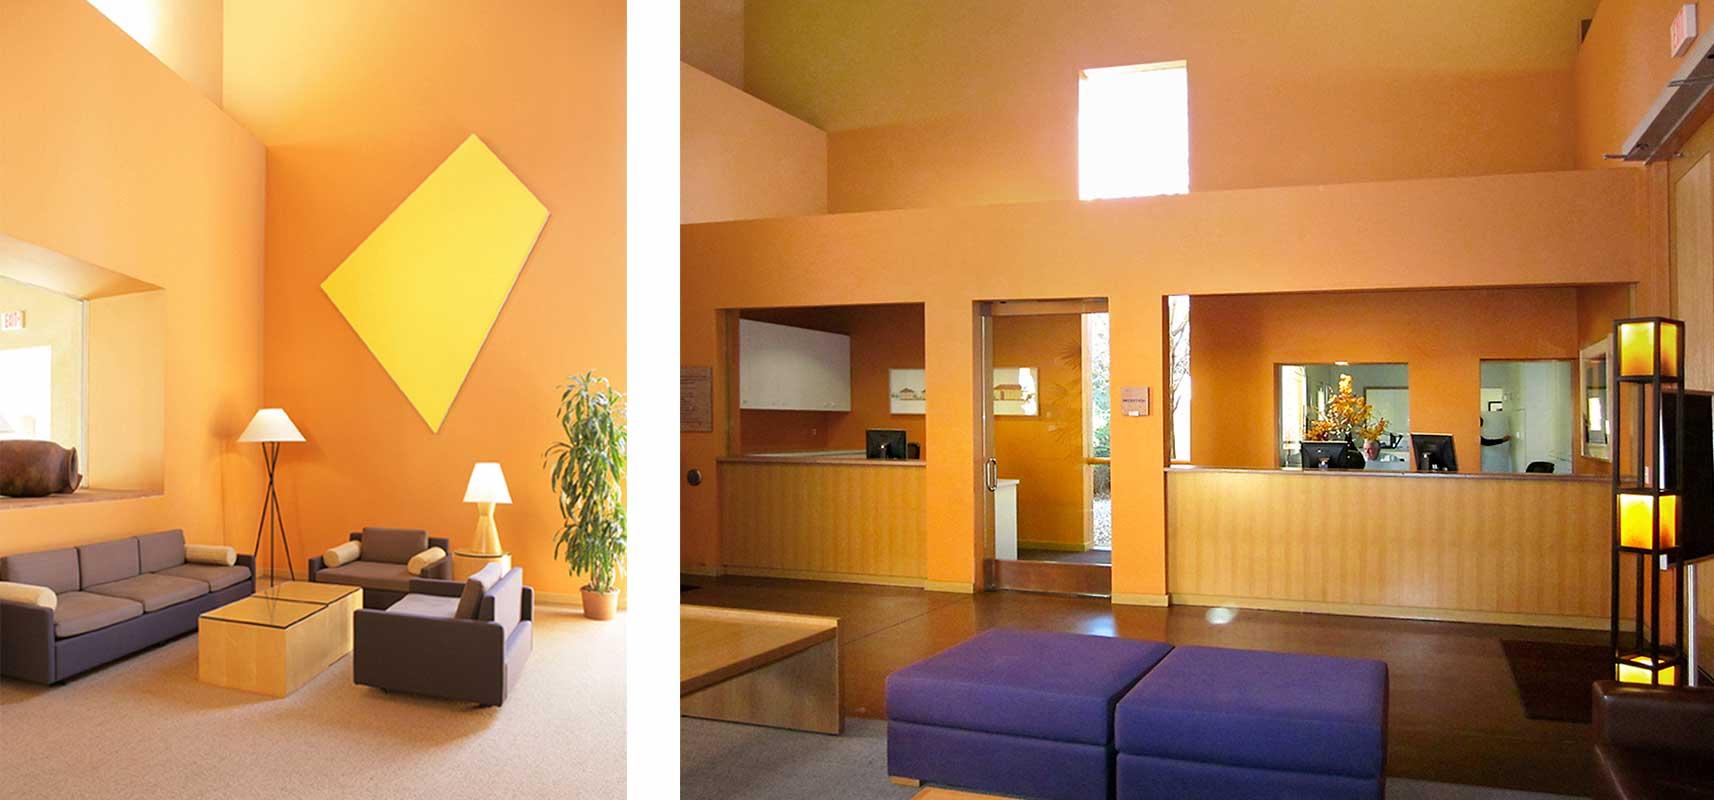 Schwab Residential Center at Stanford